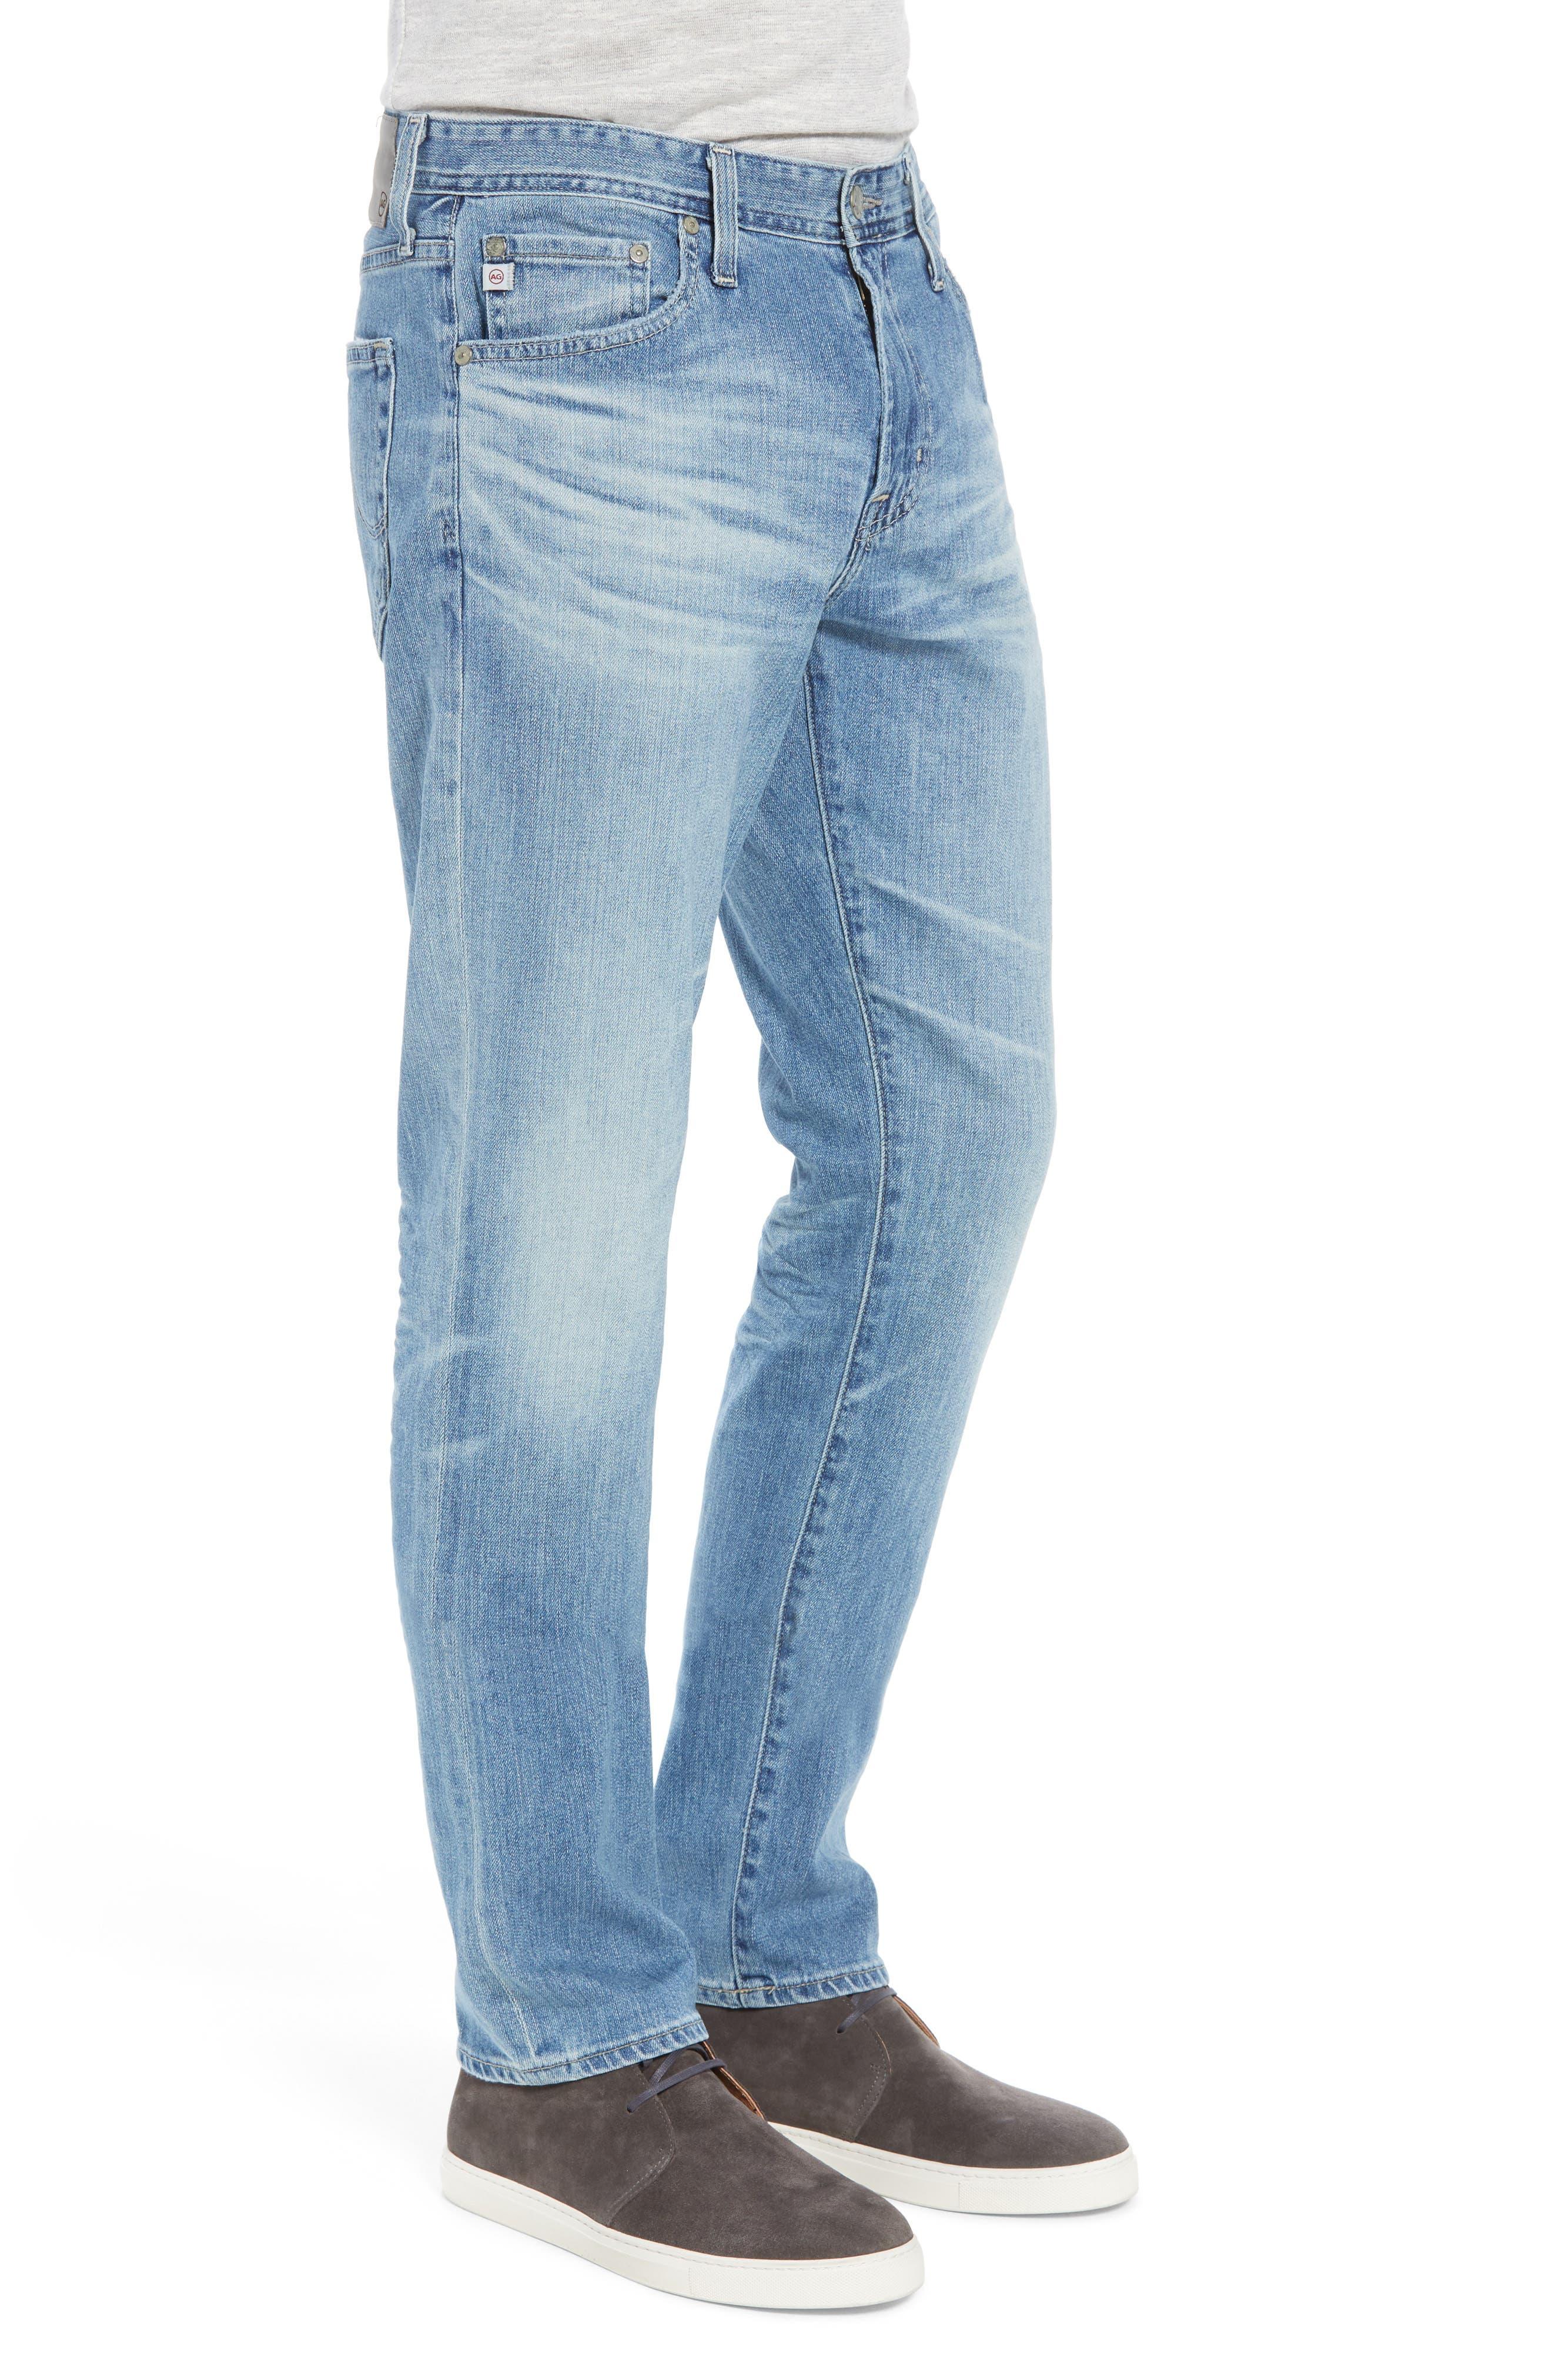 Everett Slim Straight Fit Jeans,                             Alternate thumbnail 3, color,                             18 Years Oceano